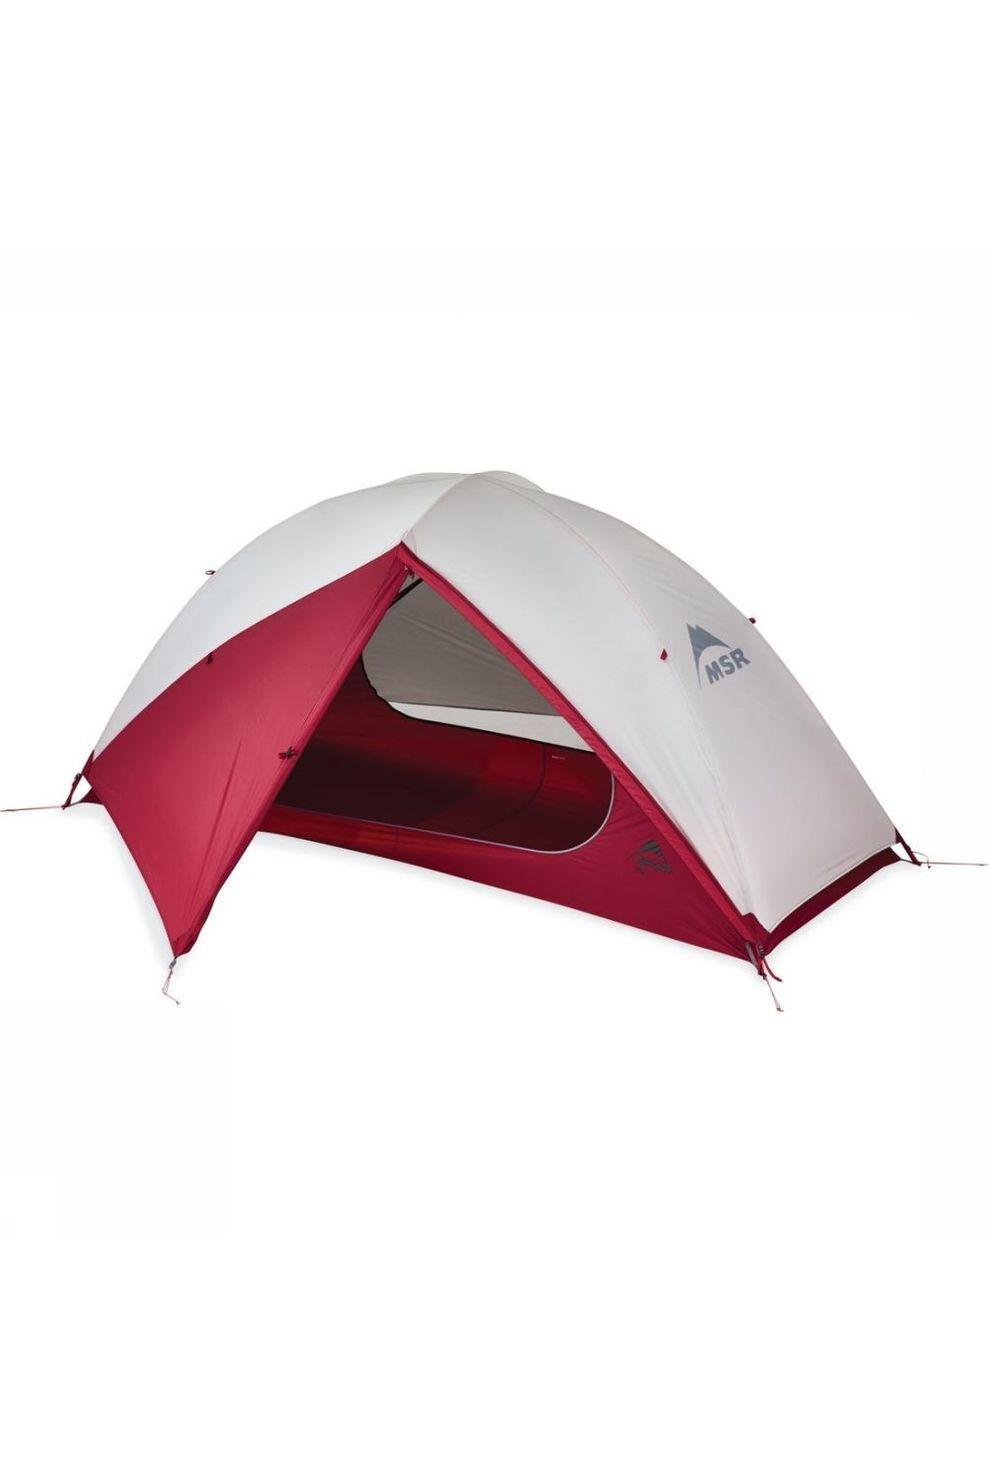 MSR Tent Zoic 1 - Grijs/Rood